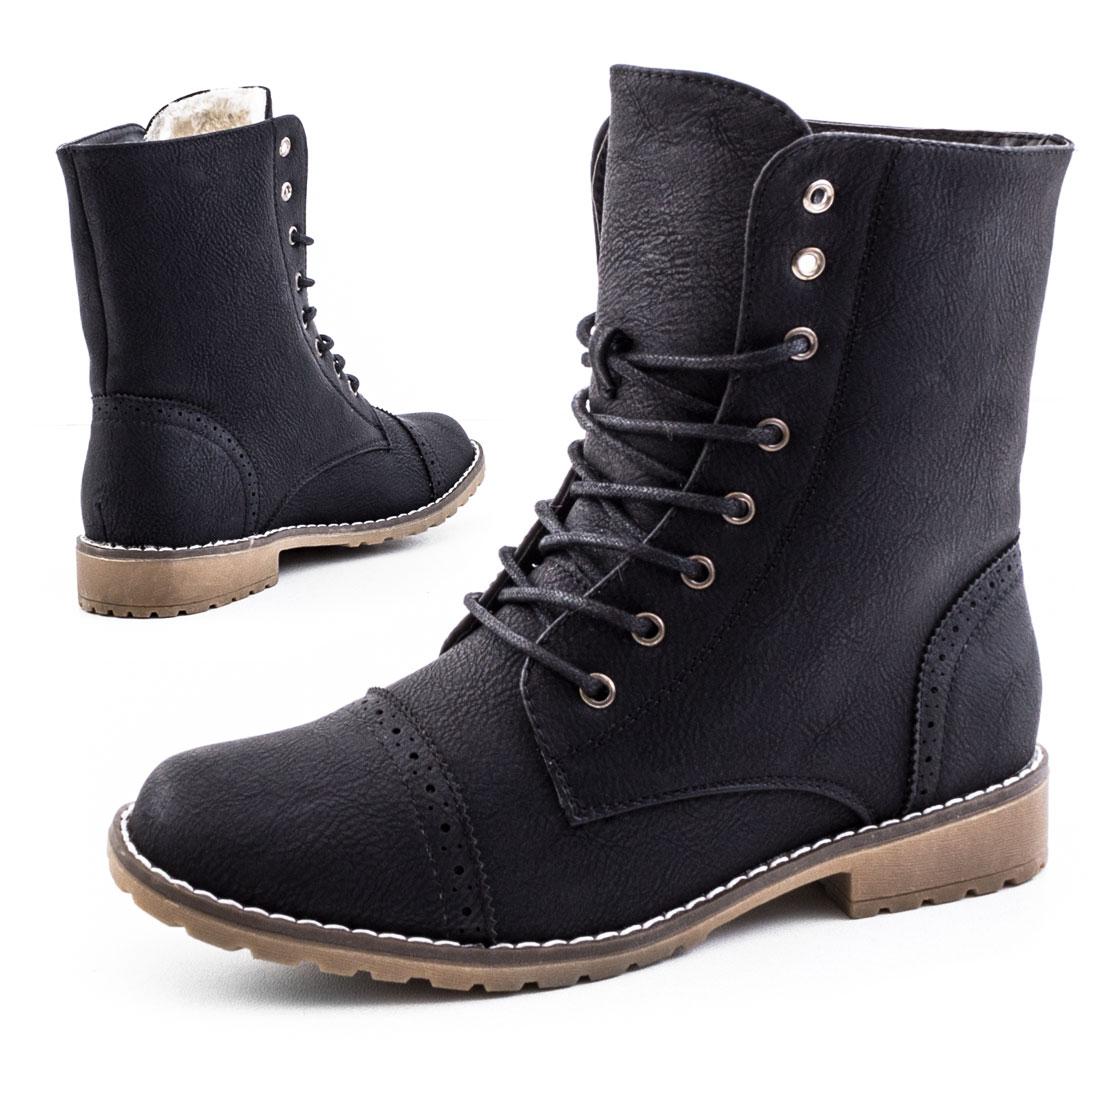 neu damen worker boots schn r stiefeletten schuhe gr e 36 37 38 39 40 41 ebay. Black Bedroom Furniture Sets. Home Design Ideas